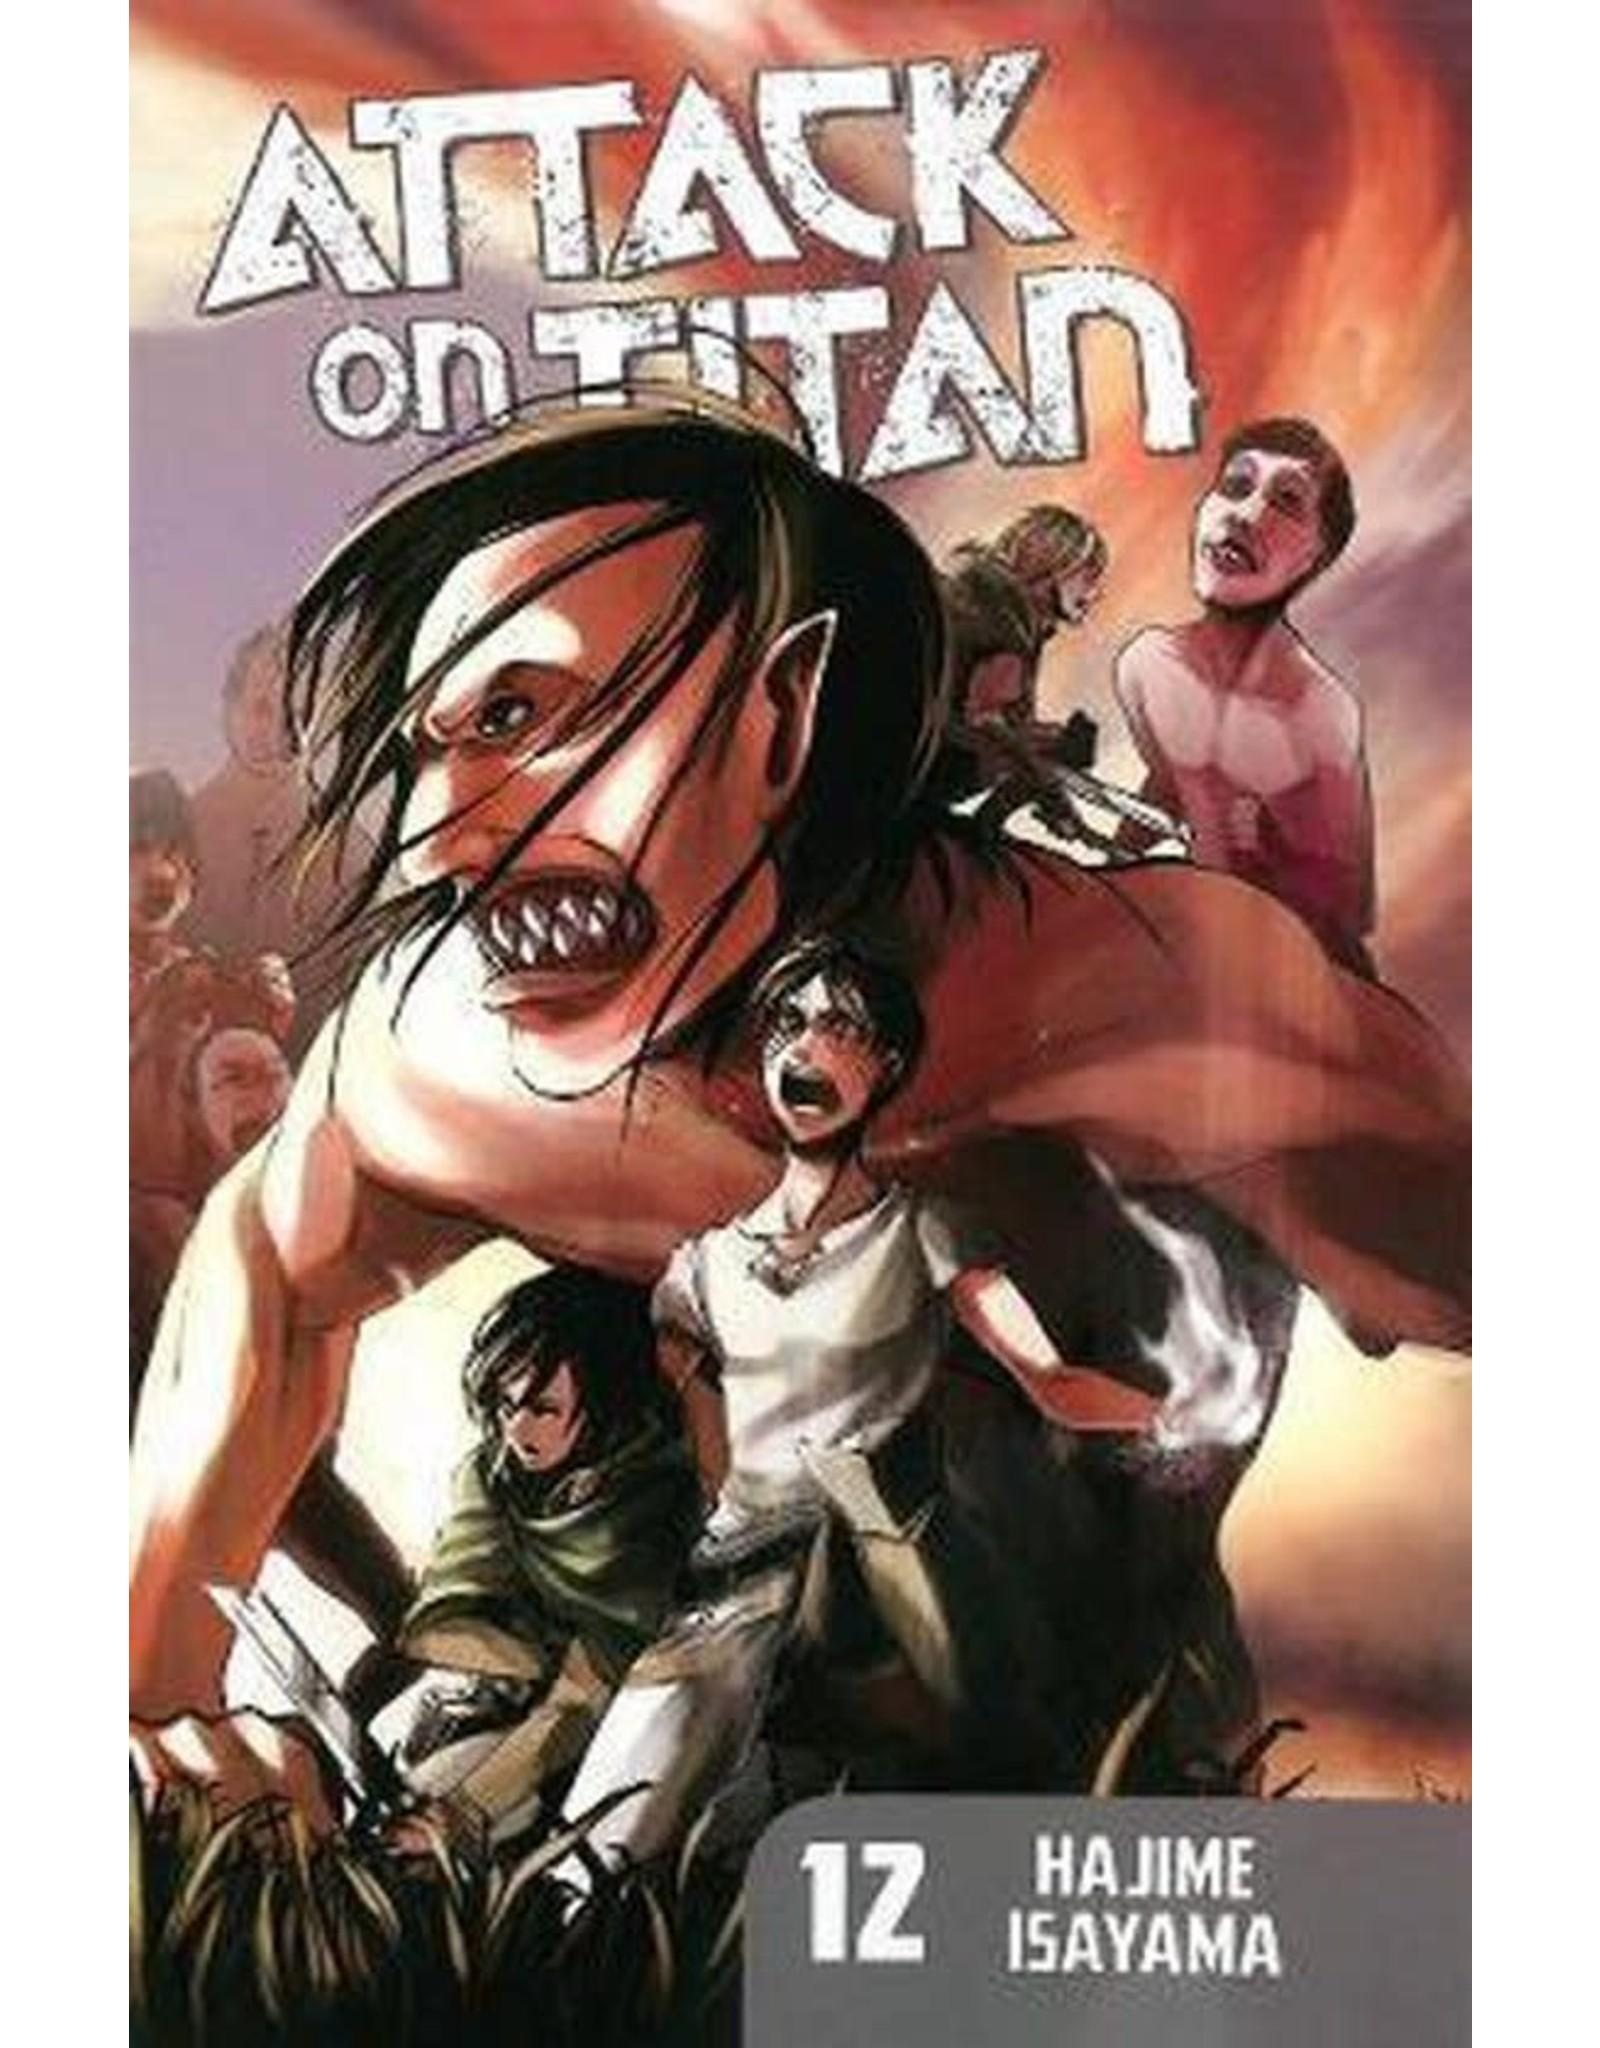 Attack on Titan 12 (English) - Manga